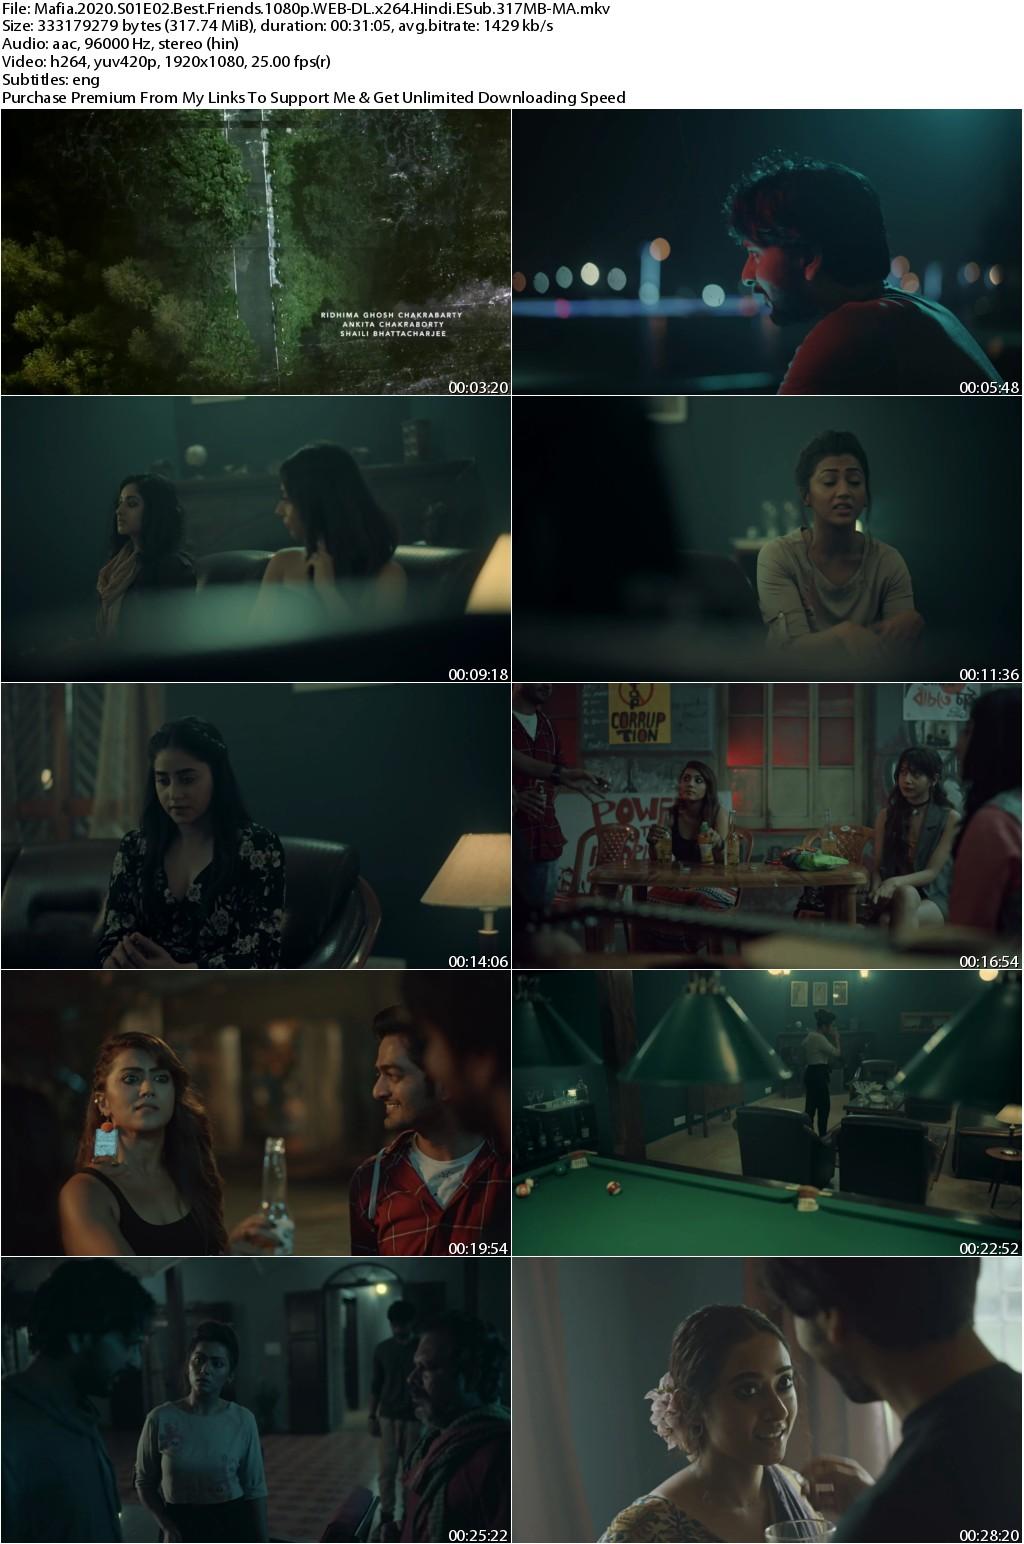 Mafia 2020 S01 Complete Hindi 1080p WEB-DL x264 ESub 2.63GB-MA